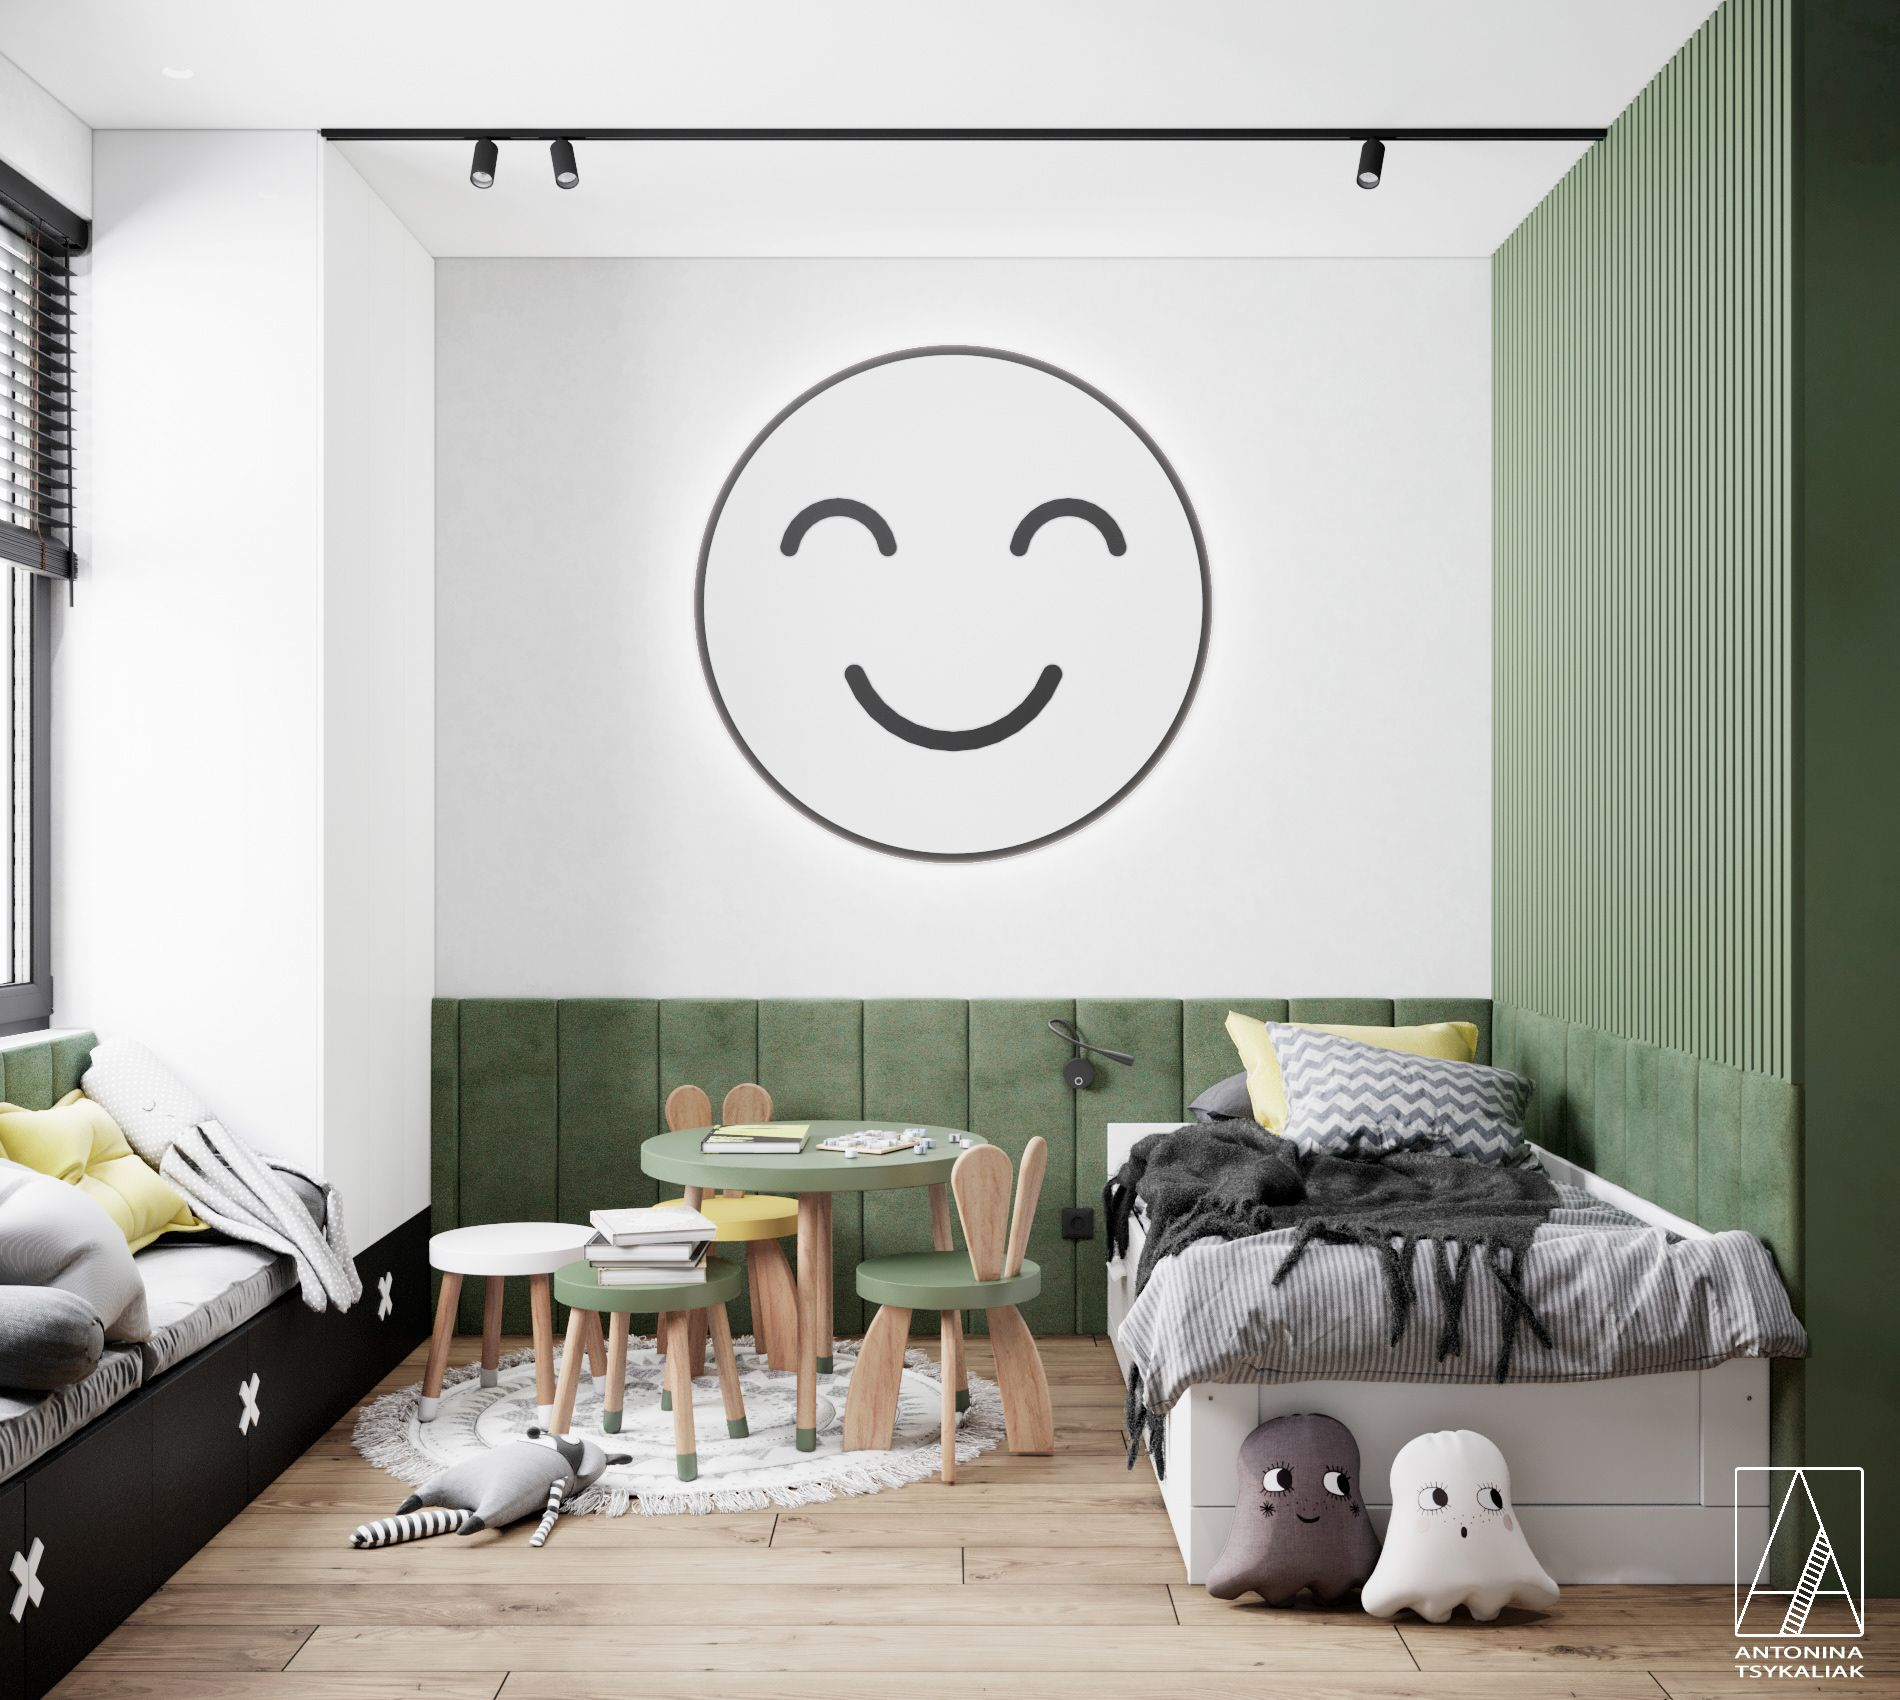 Kids Room Design By Alekhina Architecture Bedroom Design Kids Room Design Kids Room Interior Design